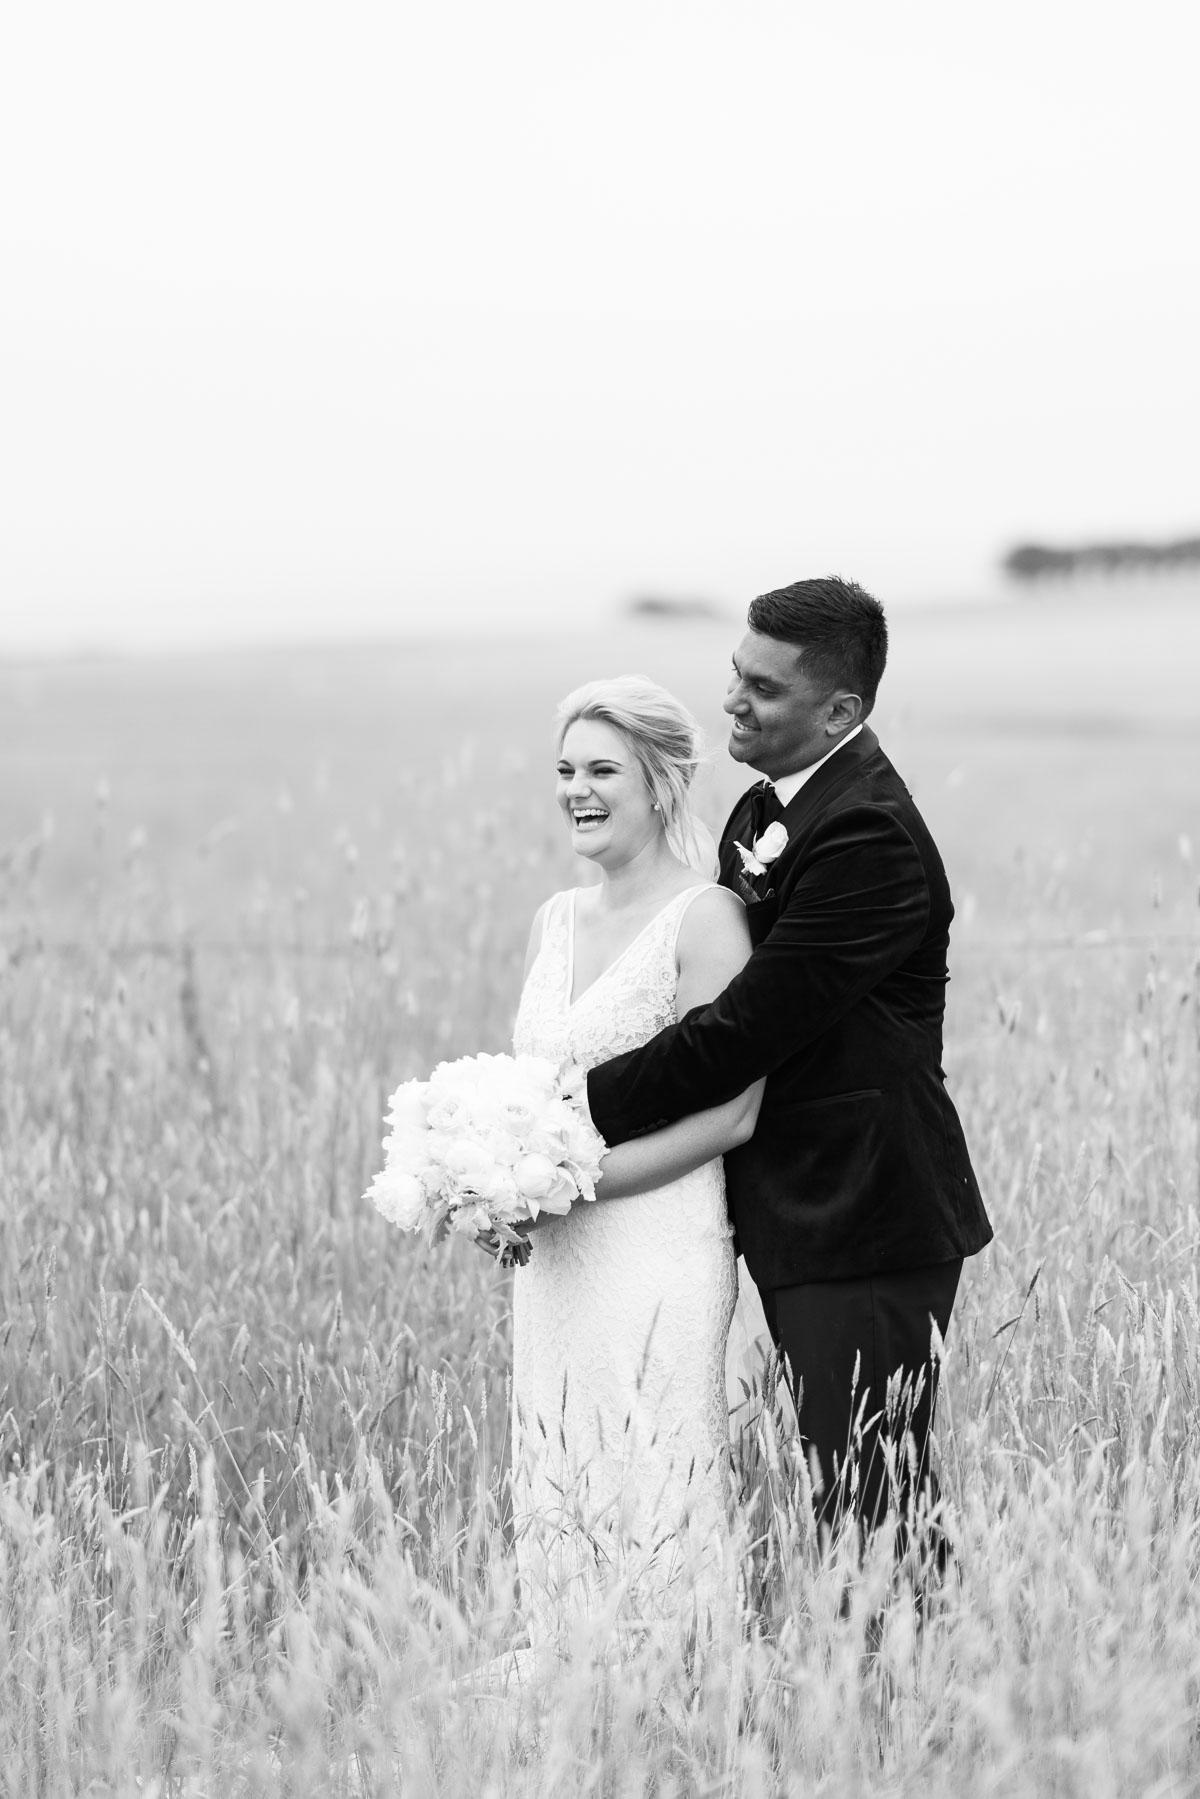 trenavin-chapel-phillip-island-wedding-heart+soul-weddings-sally-sean-01661.jpg